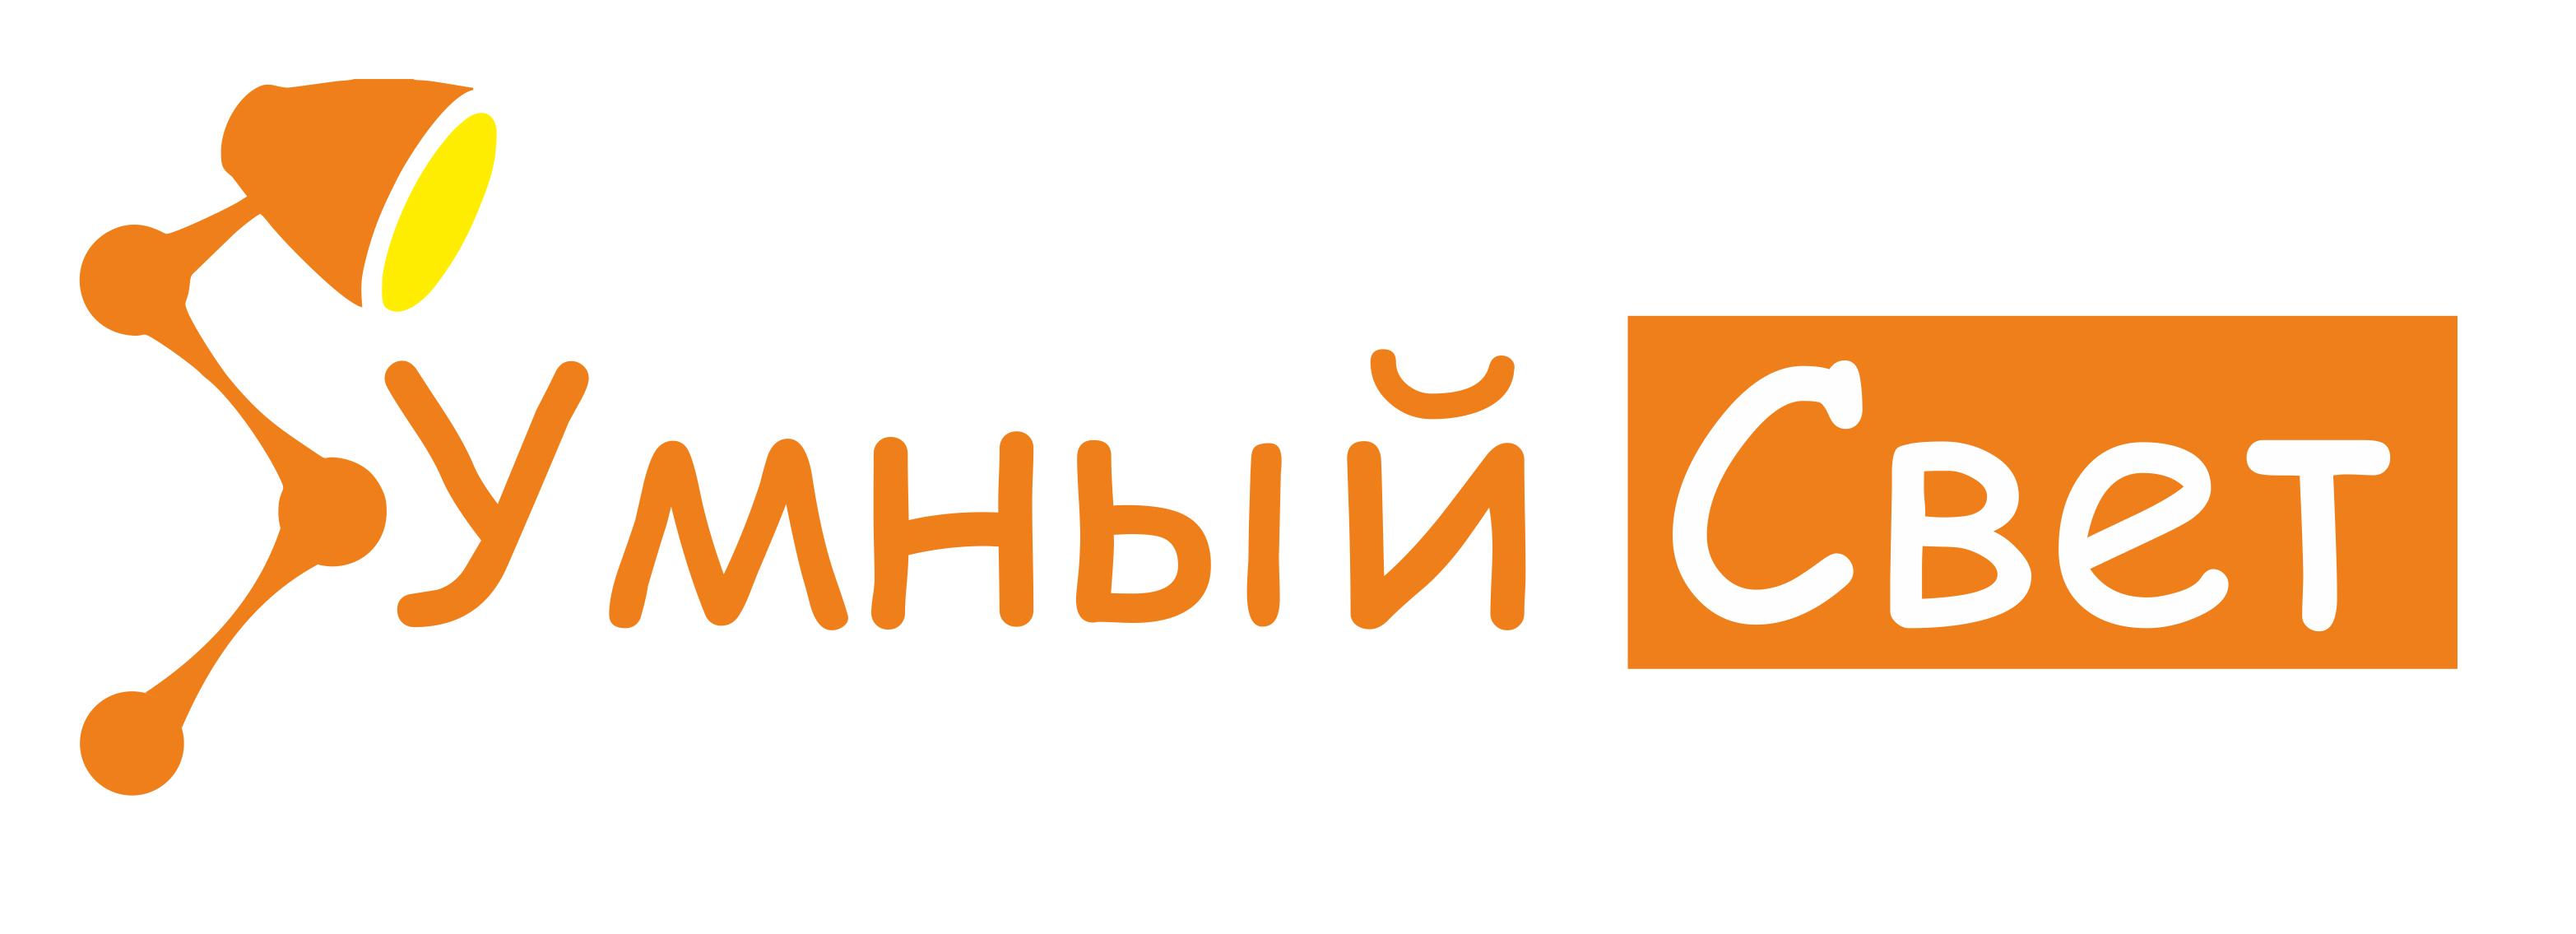 Логотип для салон-магазина освещения фото f_4155cfff92d24ba3.jpg